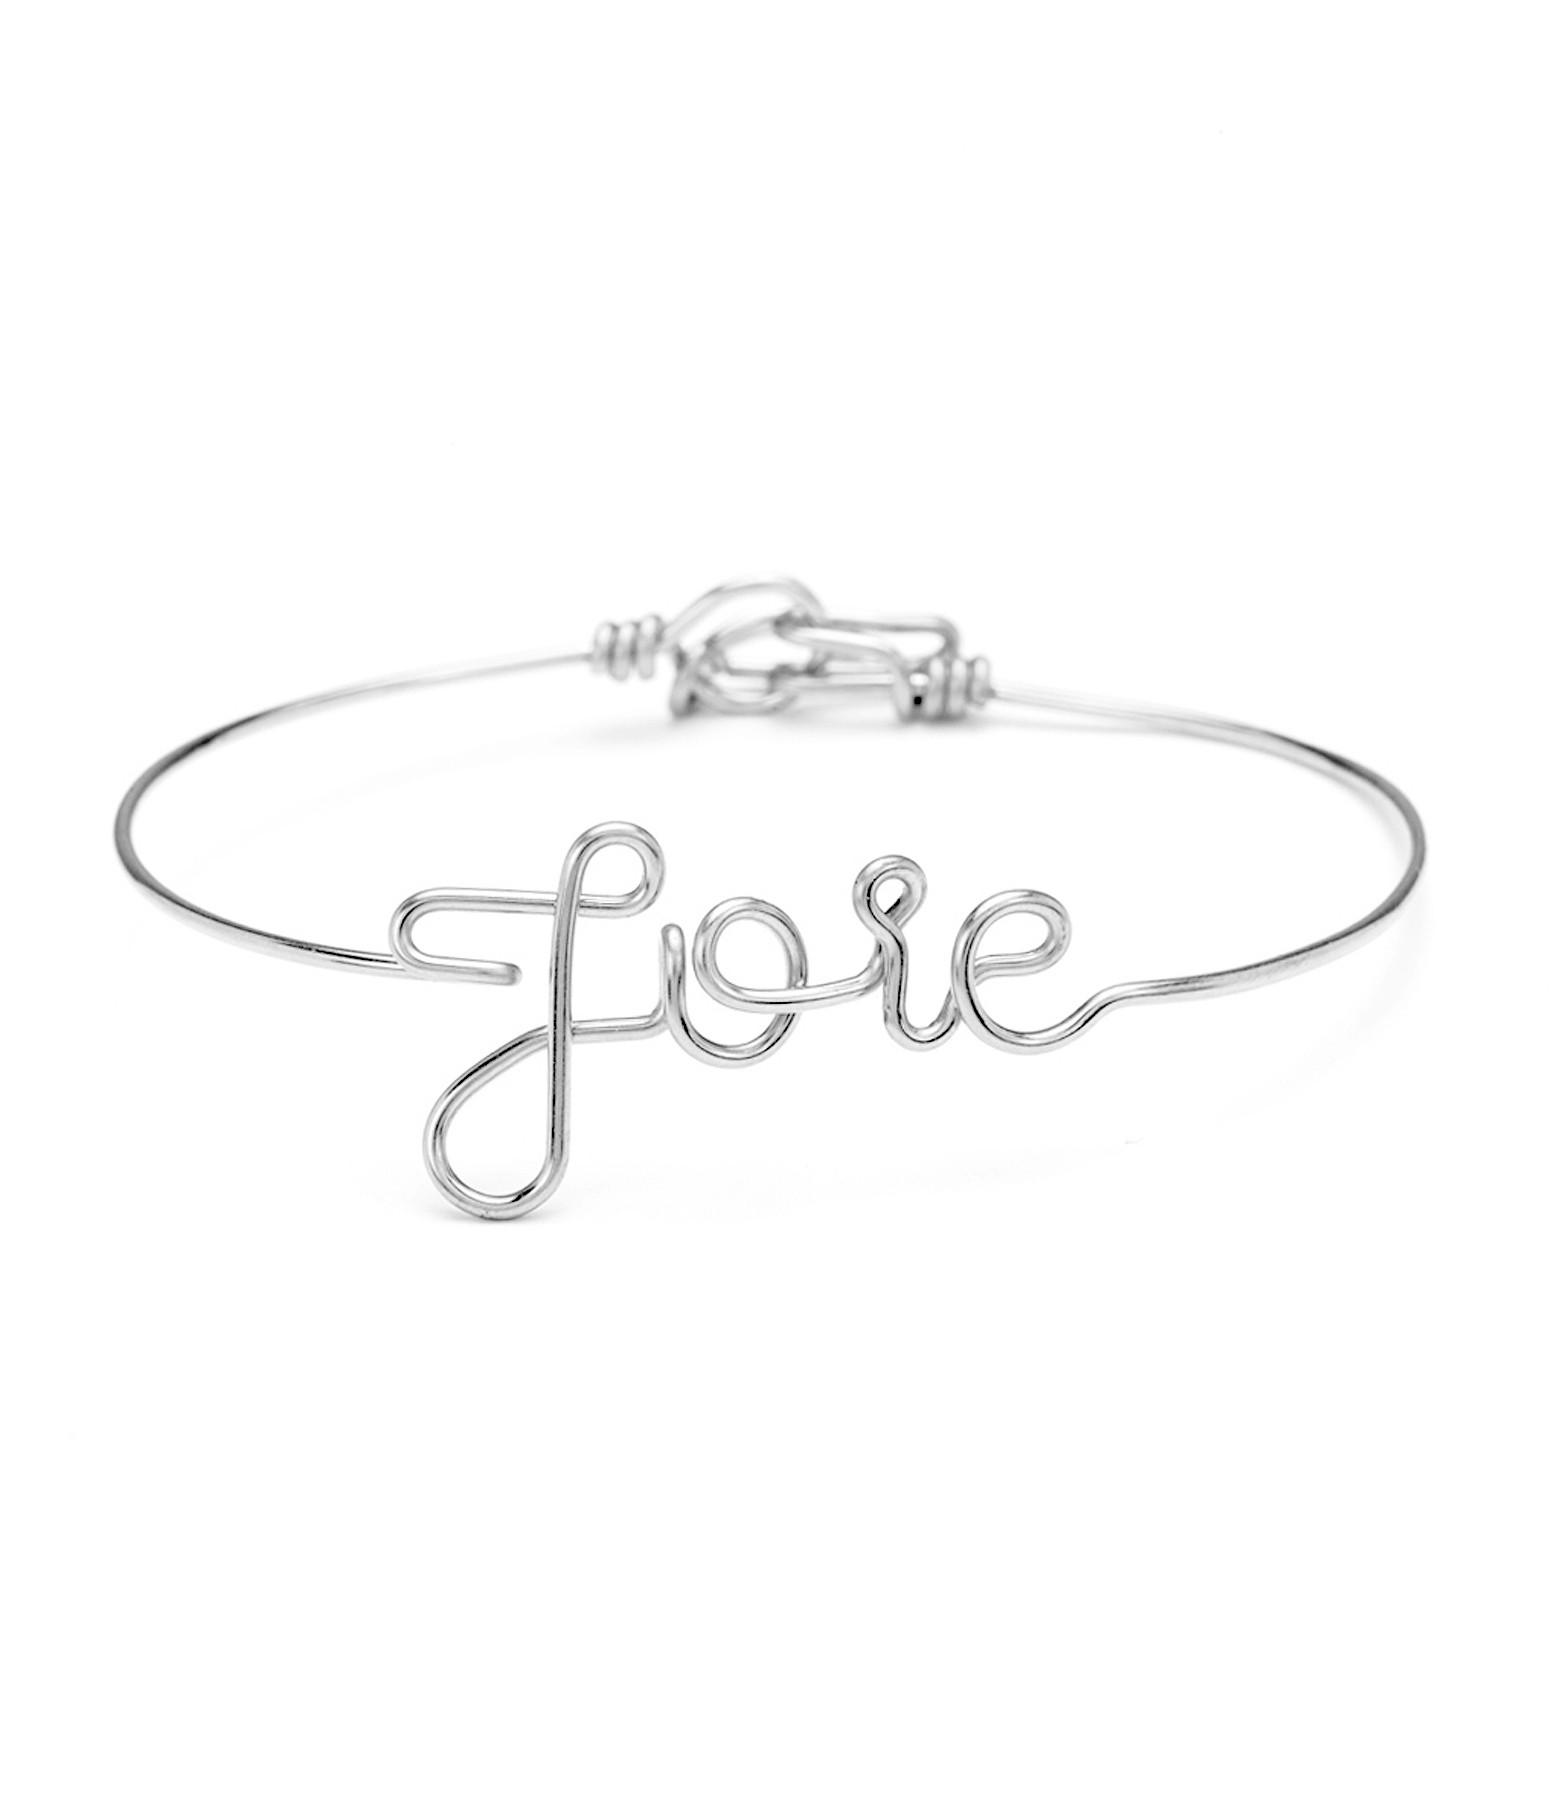 Bracelet Fil Joie Argent - ATELIER PAULIN